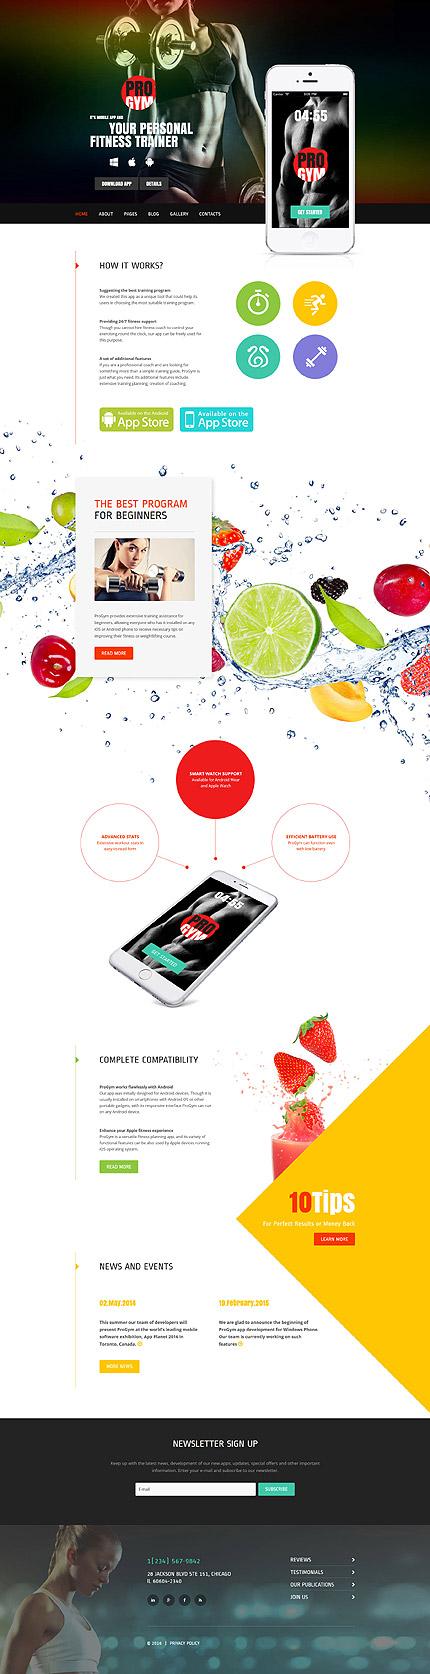 Joomla Theme/Template 59187 Main Page Screenshot